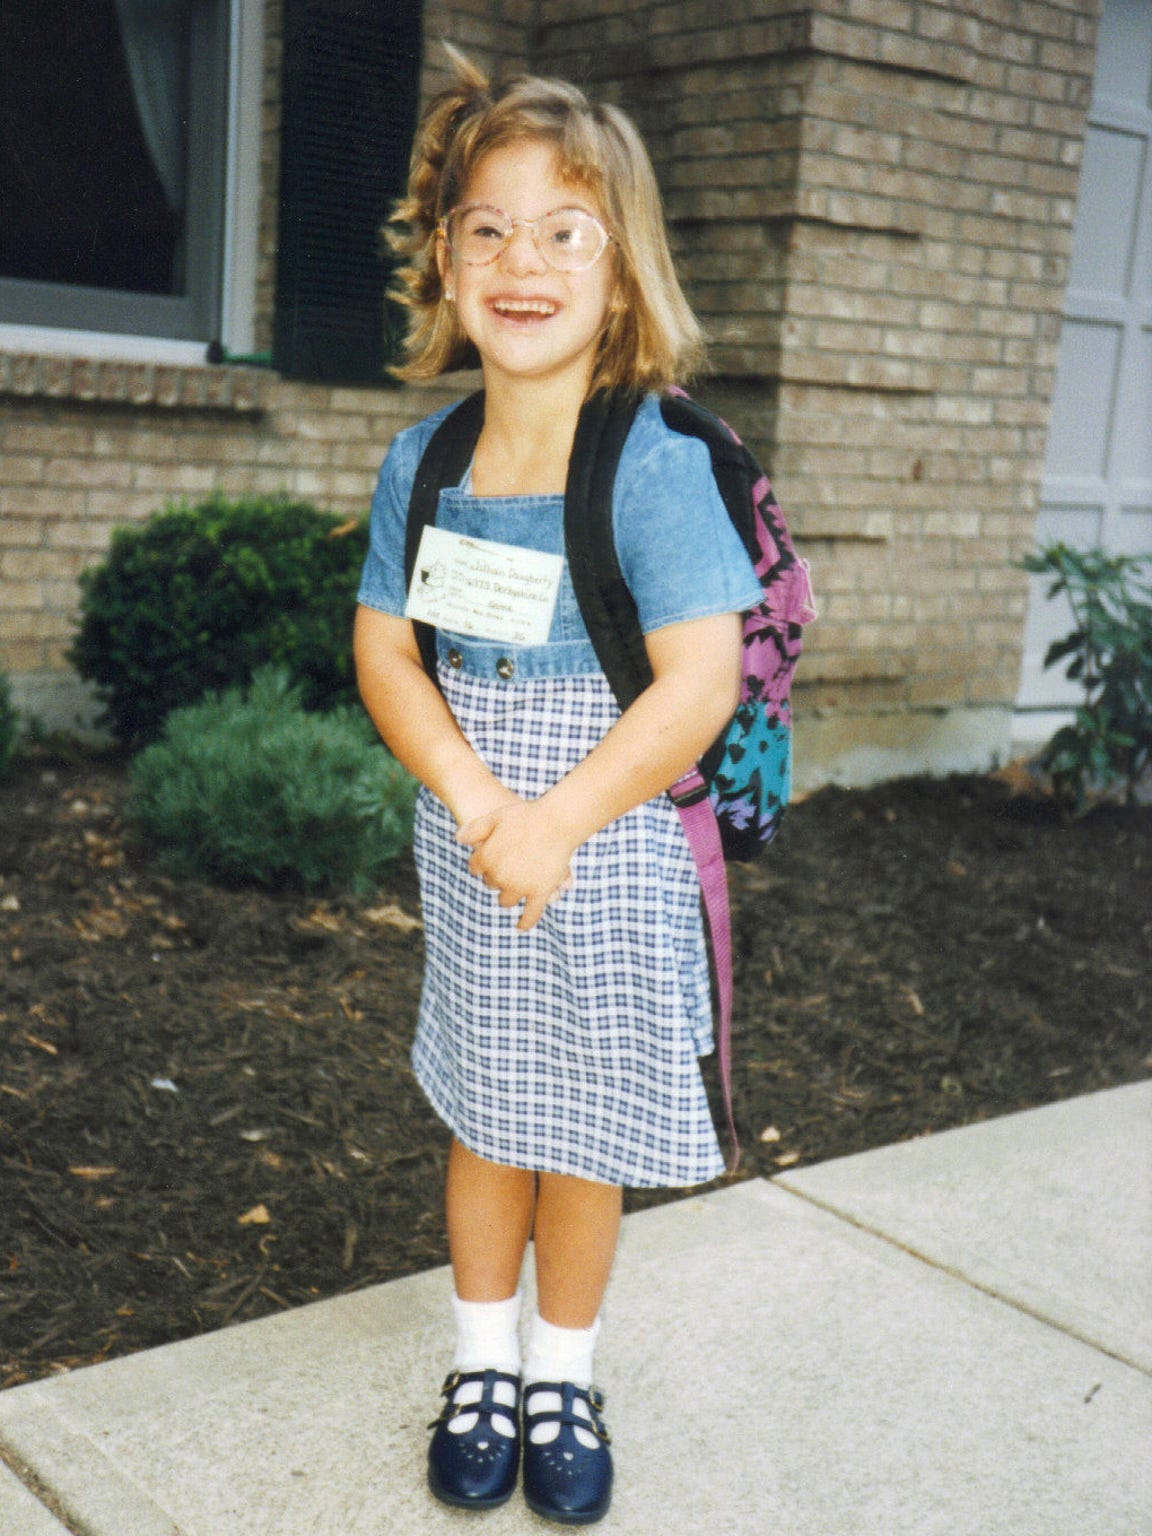 Photo undated: Jillian Phillips Daugherty was born